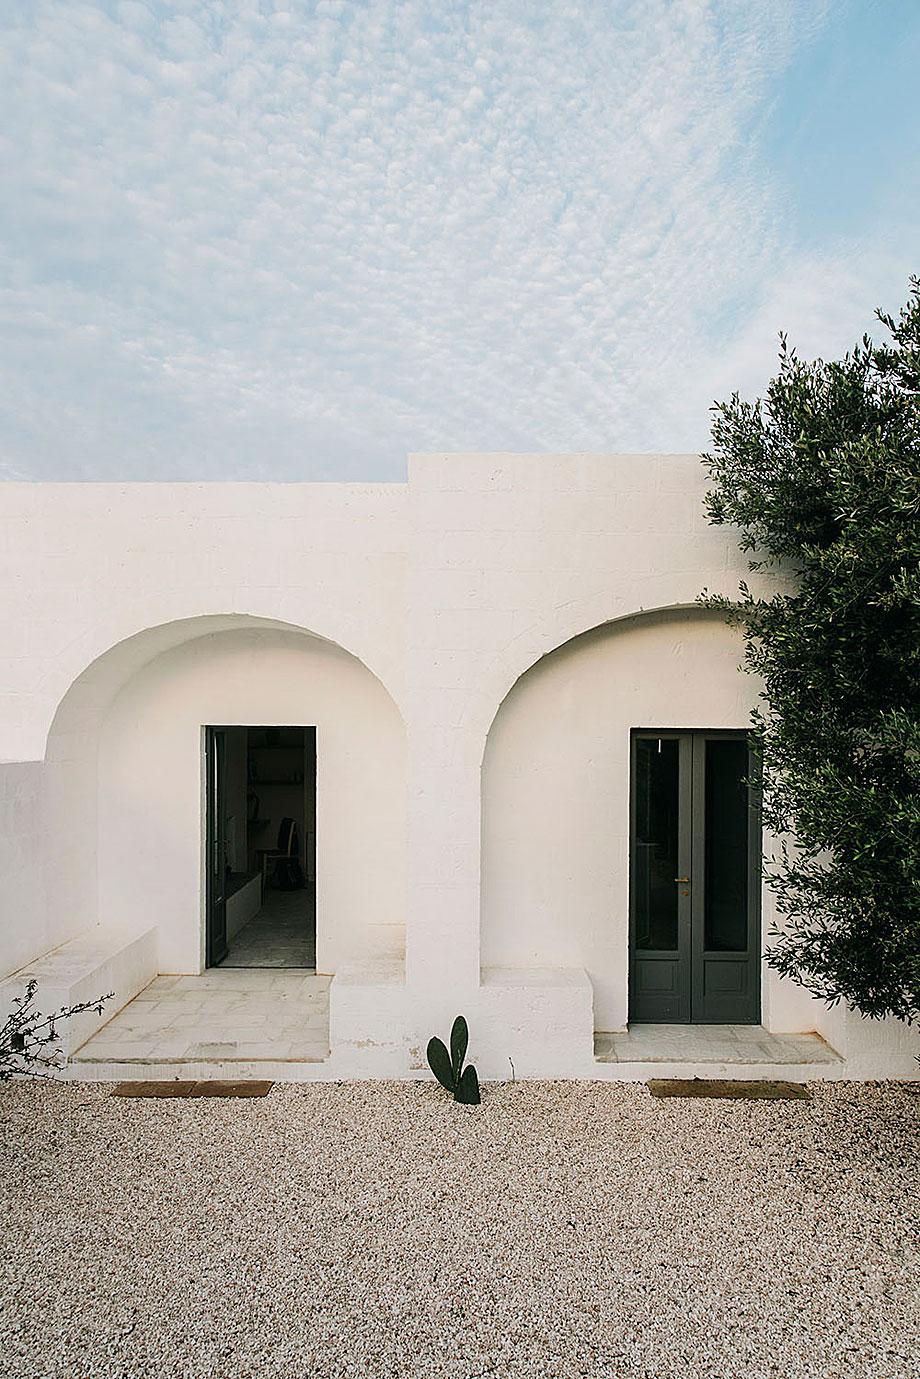 masseria-moroseta-andrew-trotter-architecture-puglia-ostuni-openhouse-15